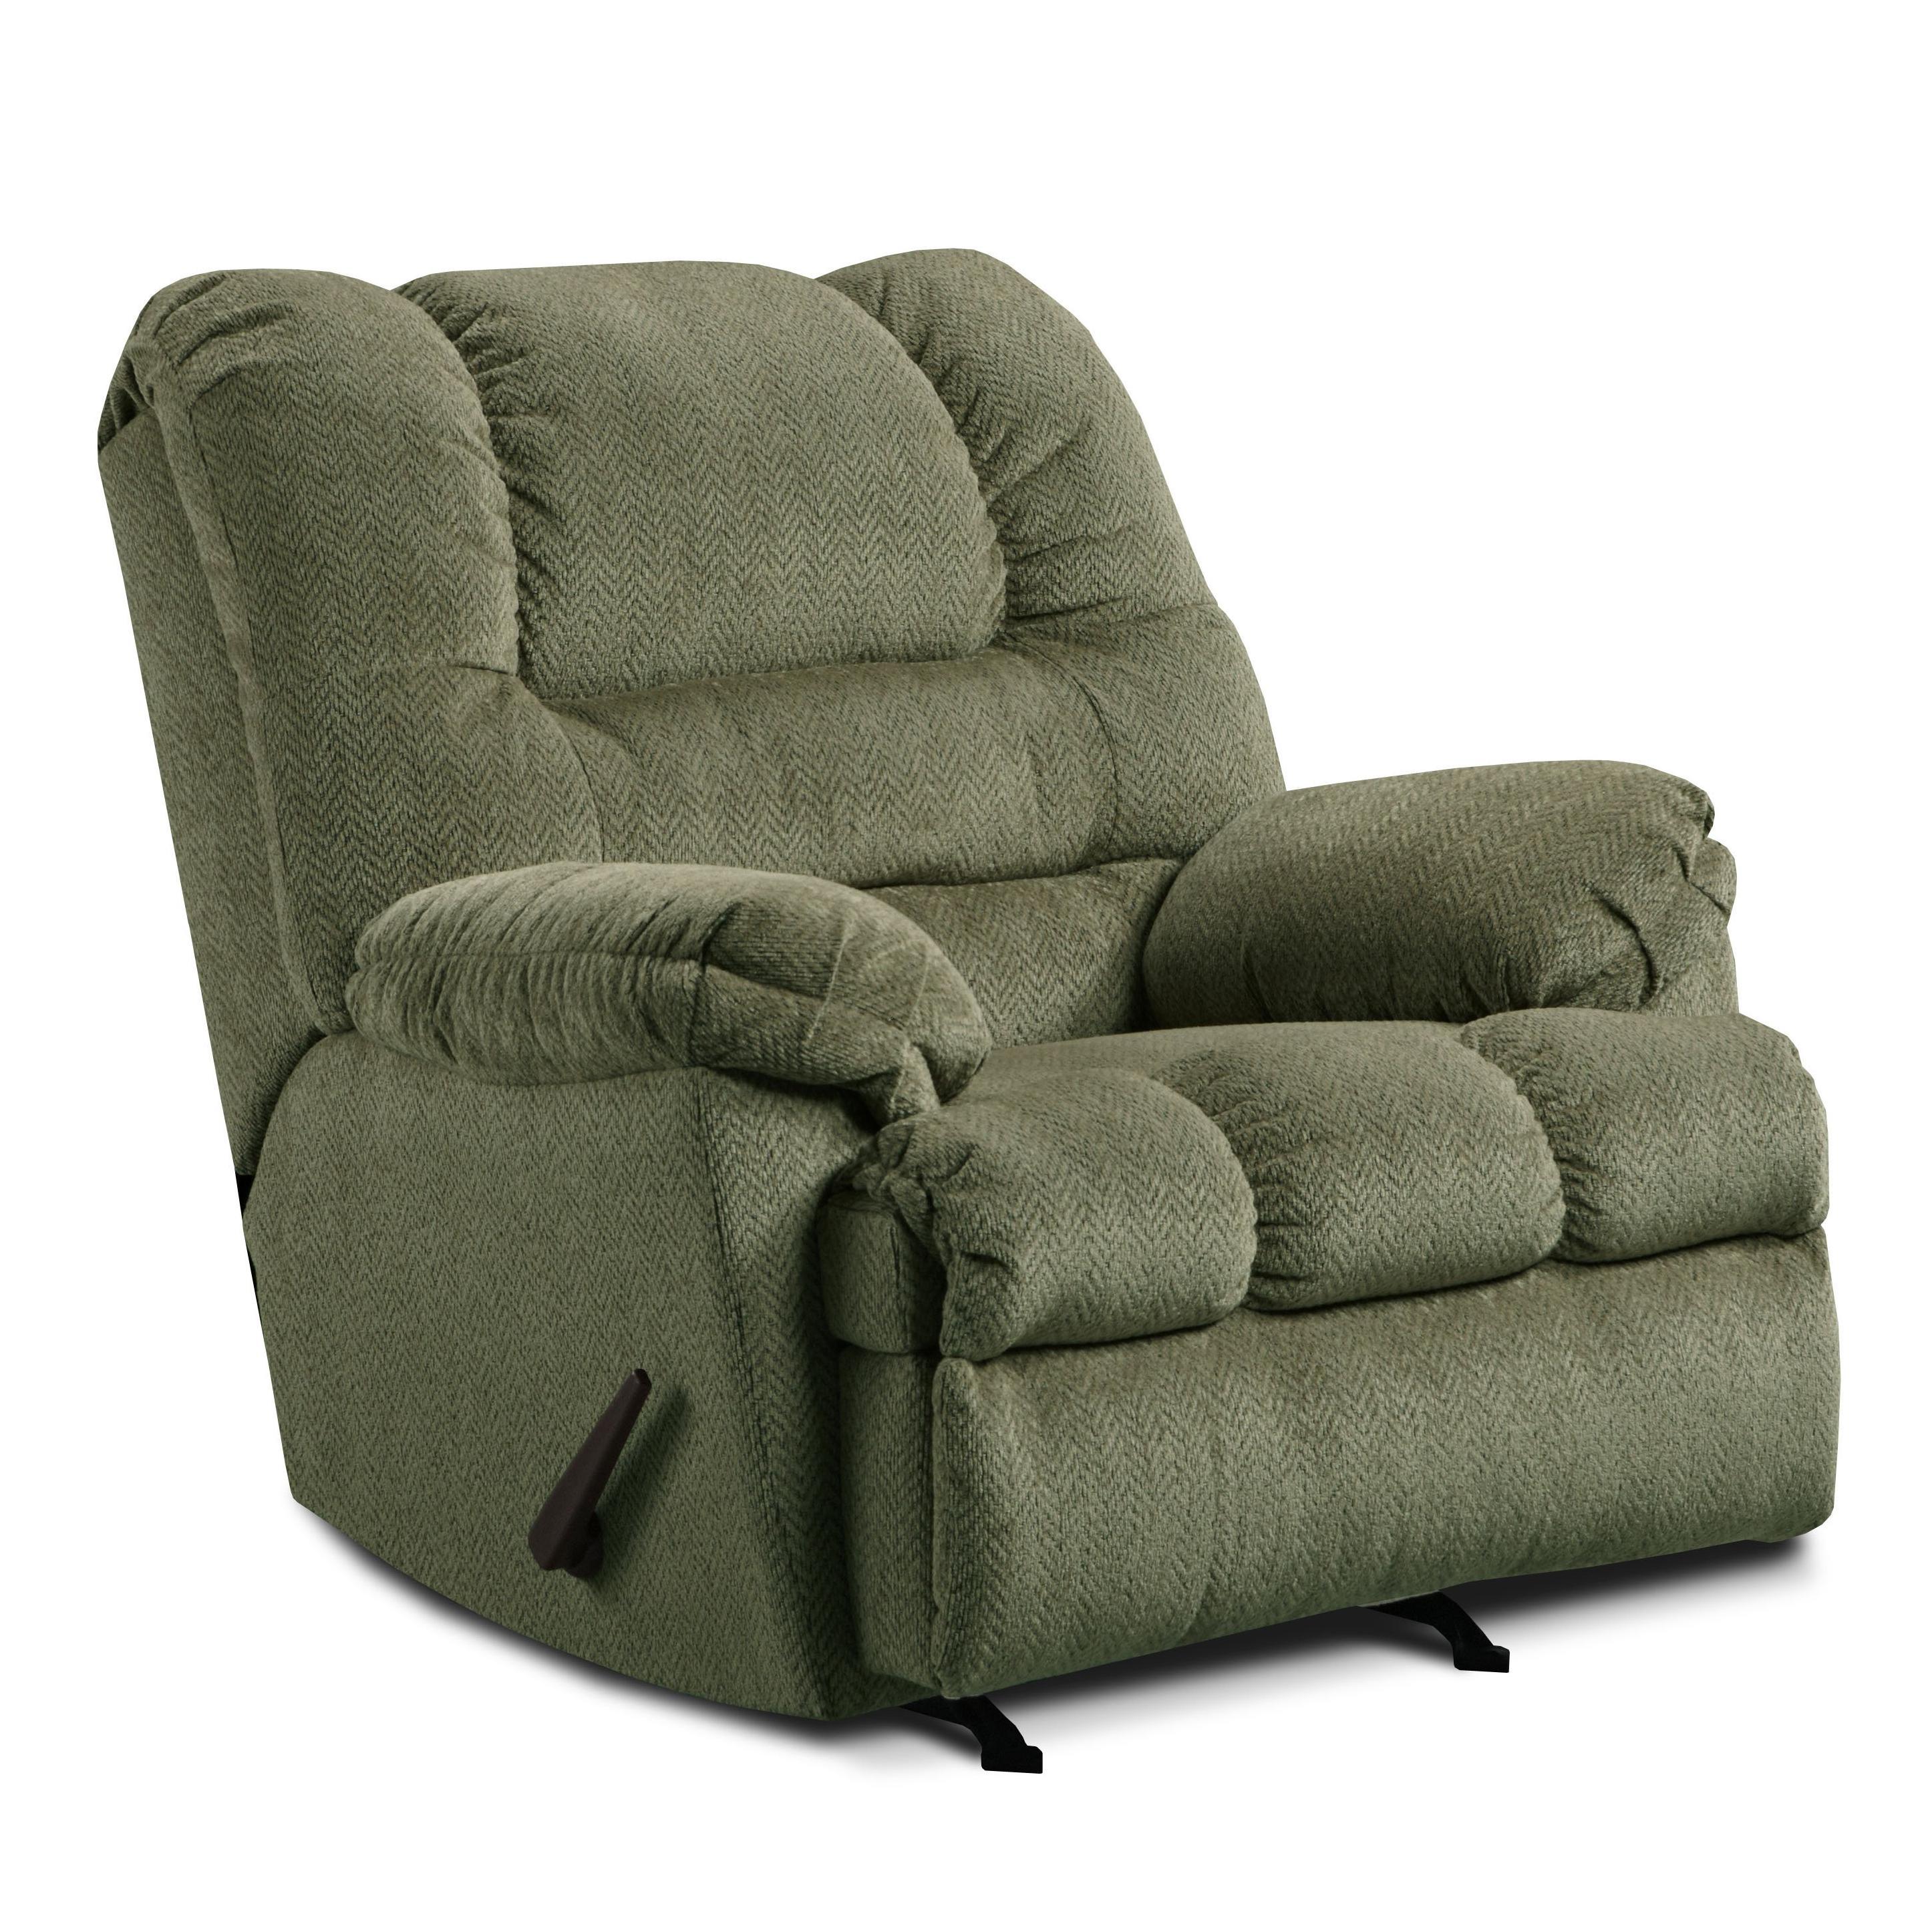 United Furniture Industries 600 600ROCKERRECLINER Casual